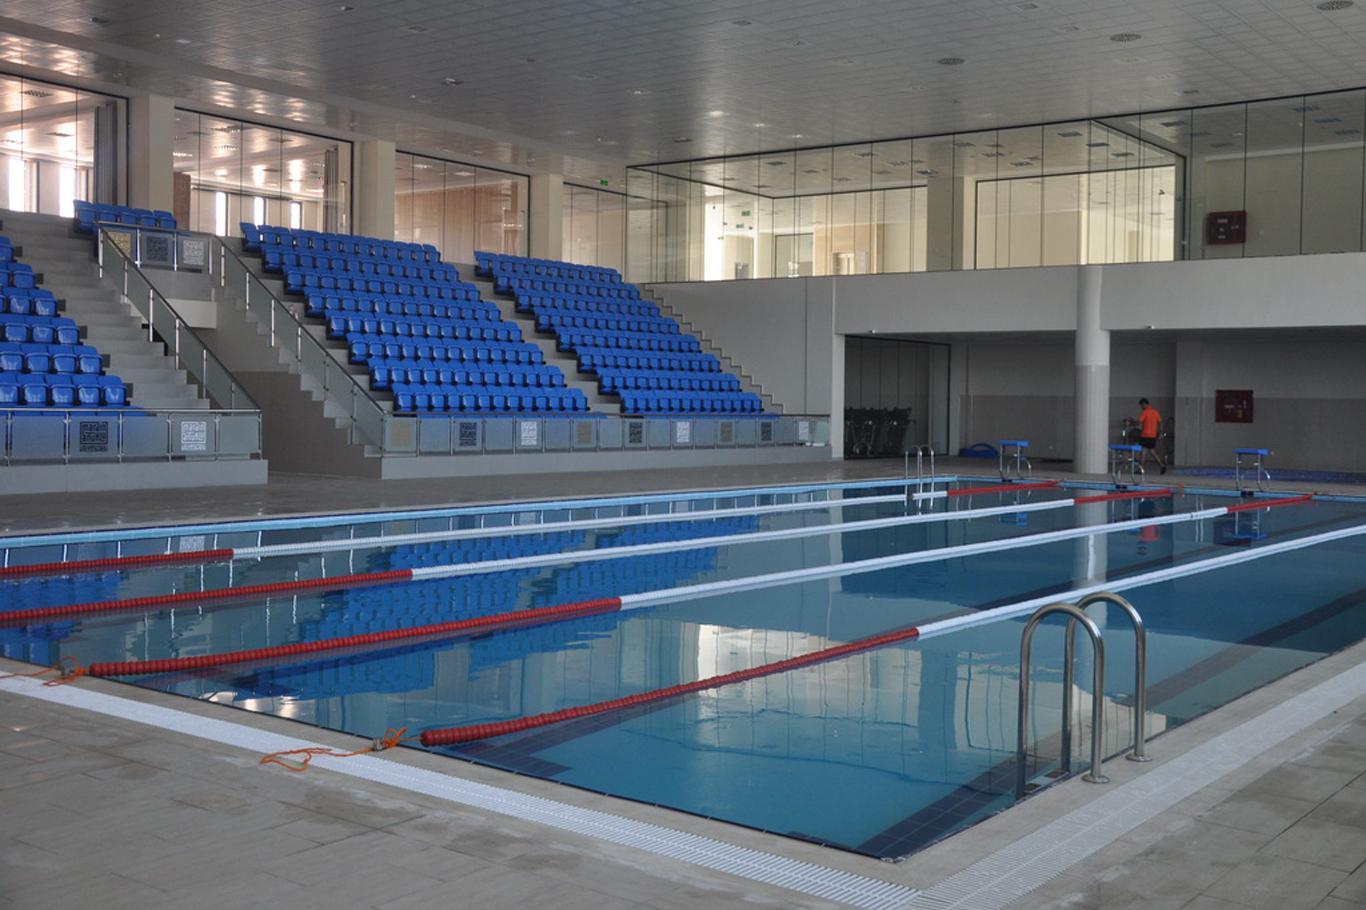 Mardin University Swimming Pool / Mardin